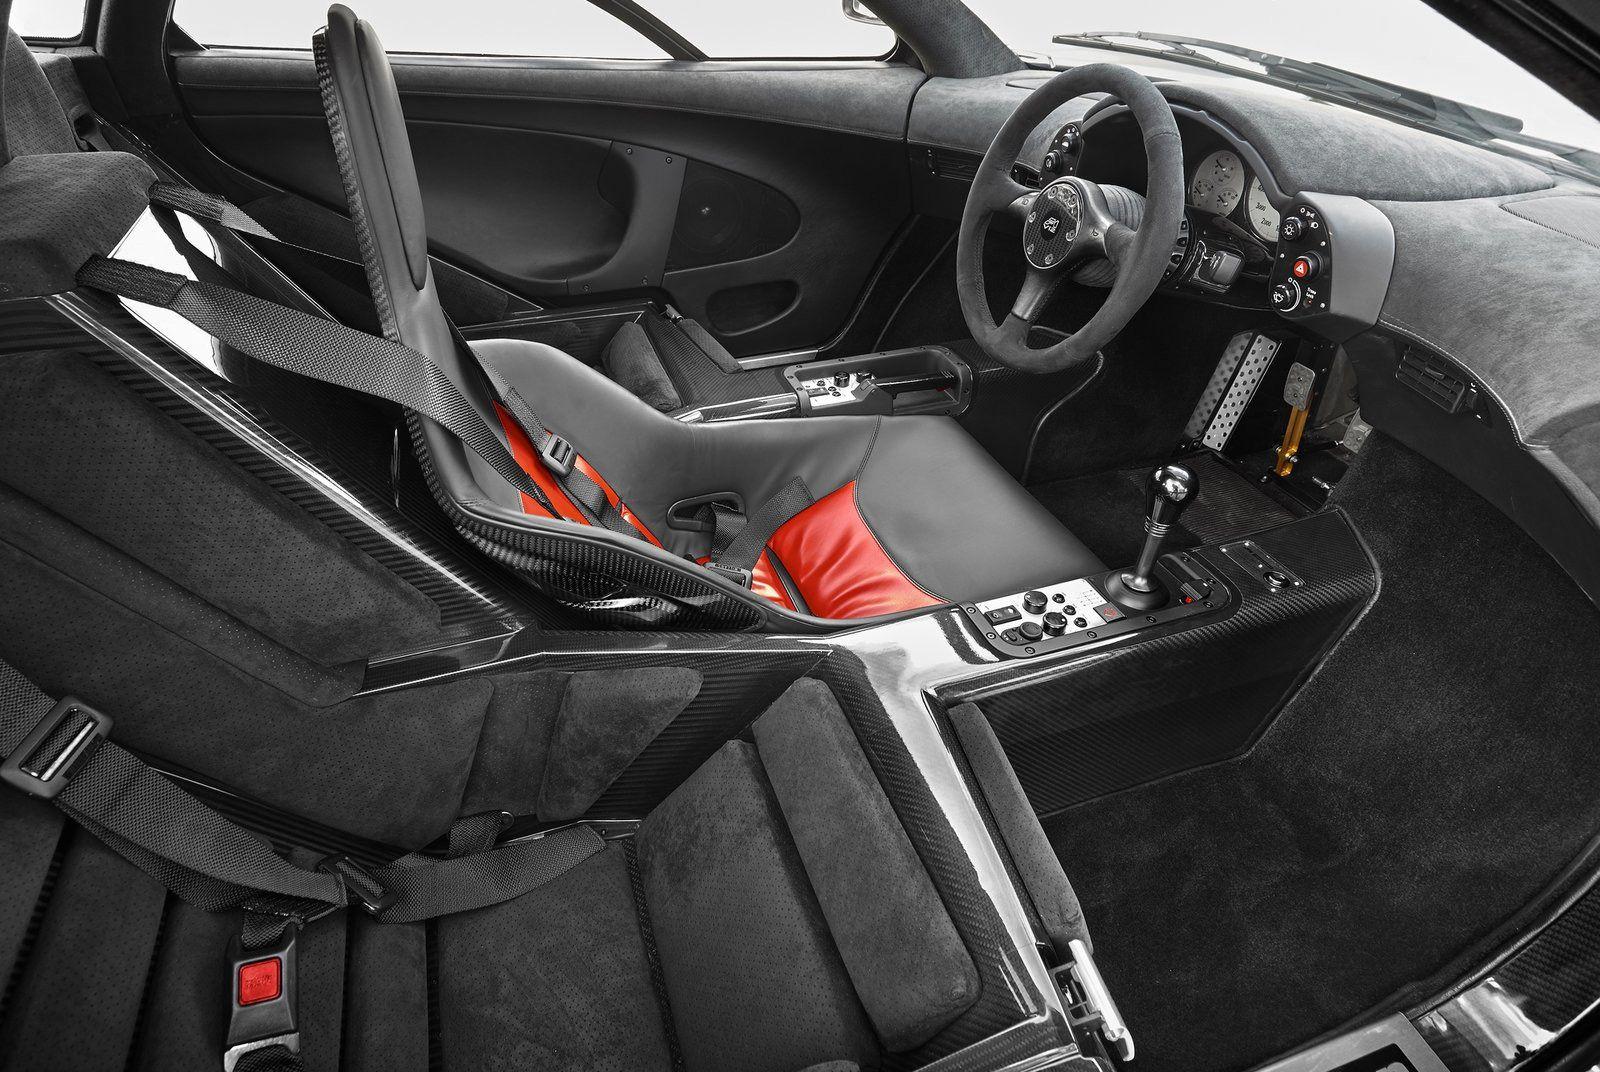 Mclaren F1-Gear-Patrol-Slide-05